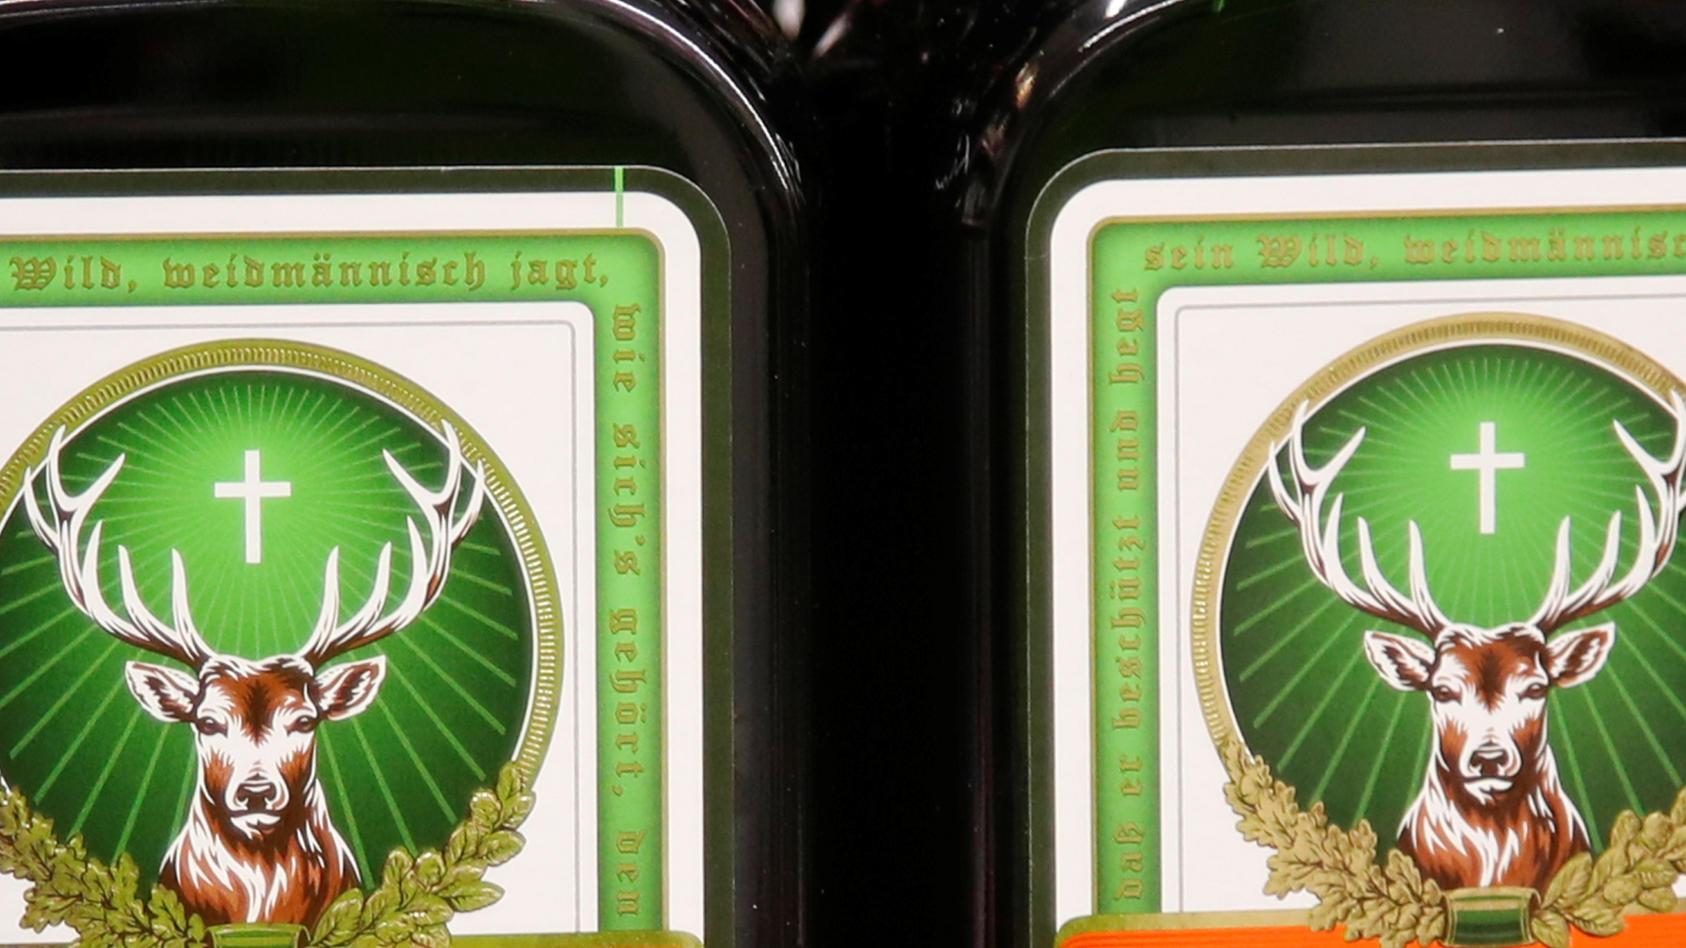 Bottles of Jaegermeister herbal liqueur are displayed in Zurich